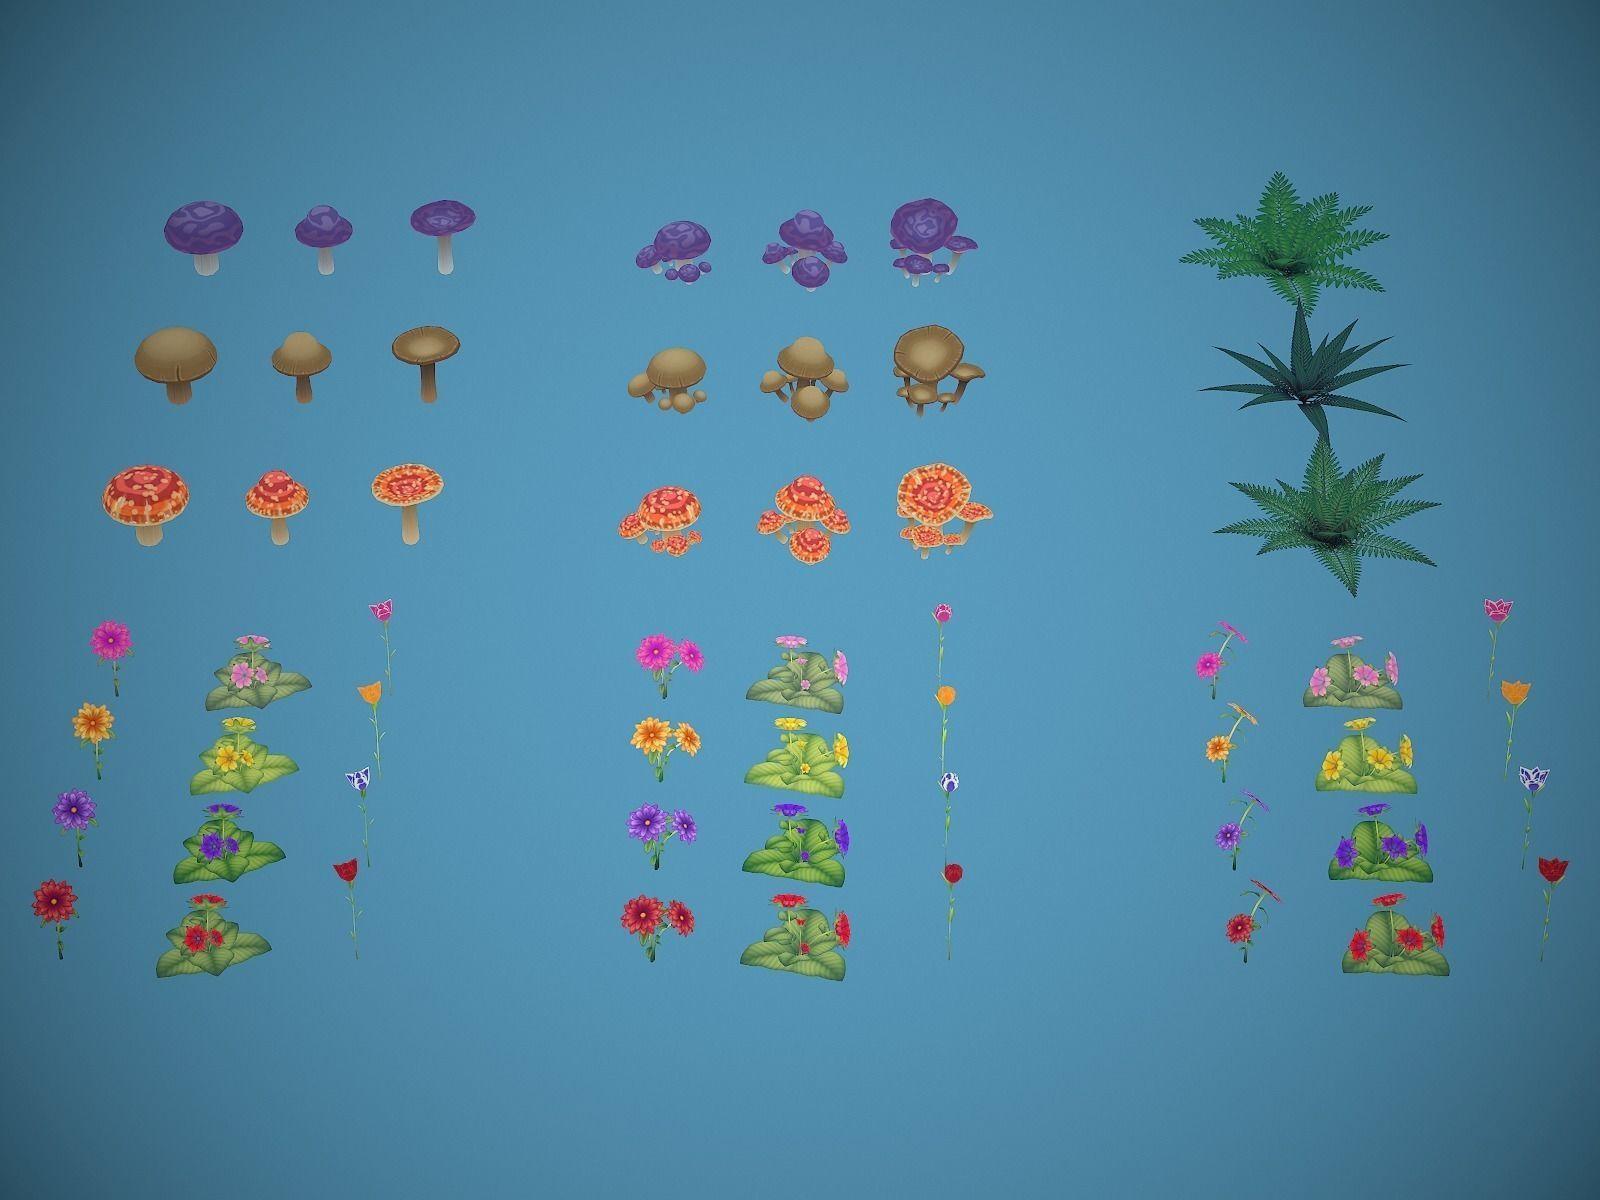 Free Lowpoly Stylized Foliage